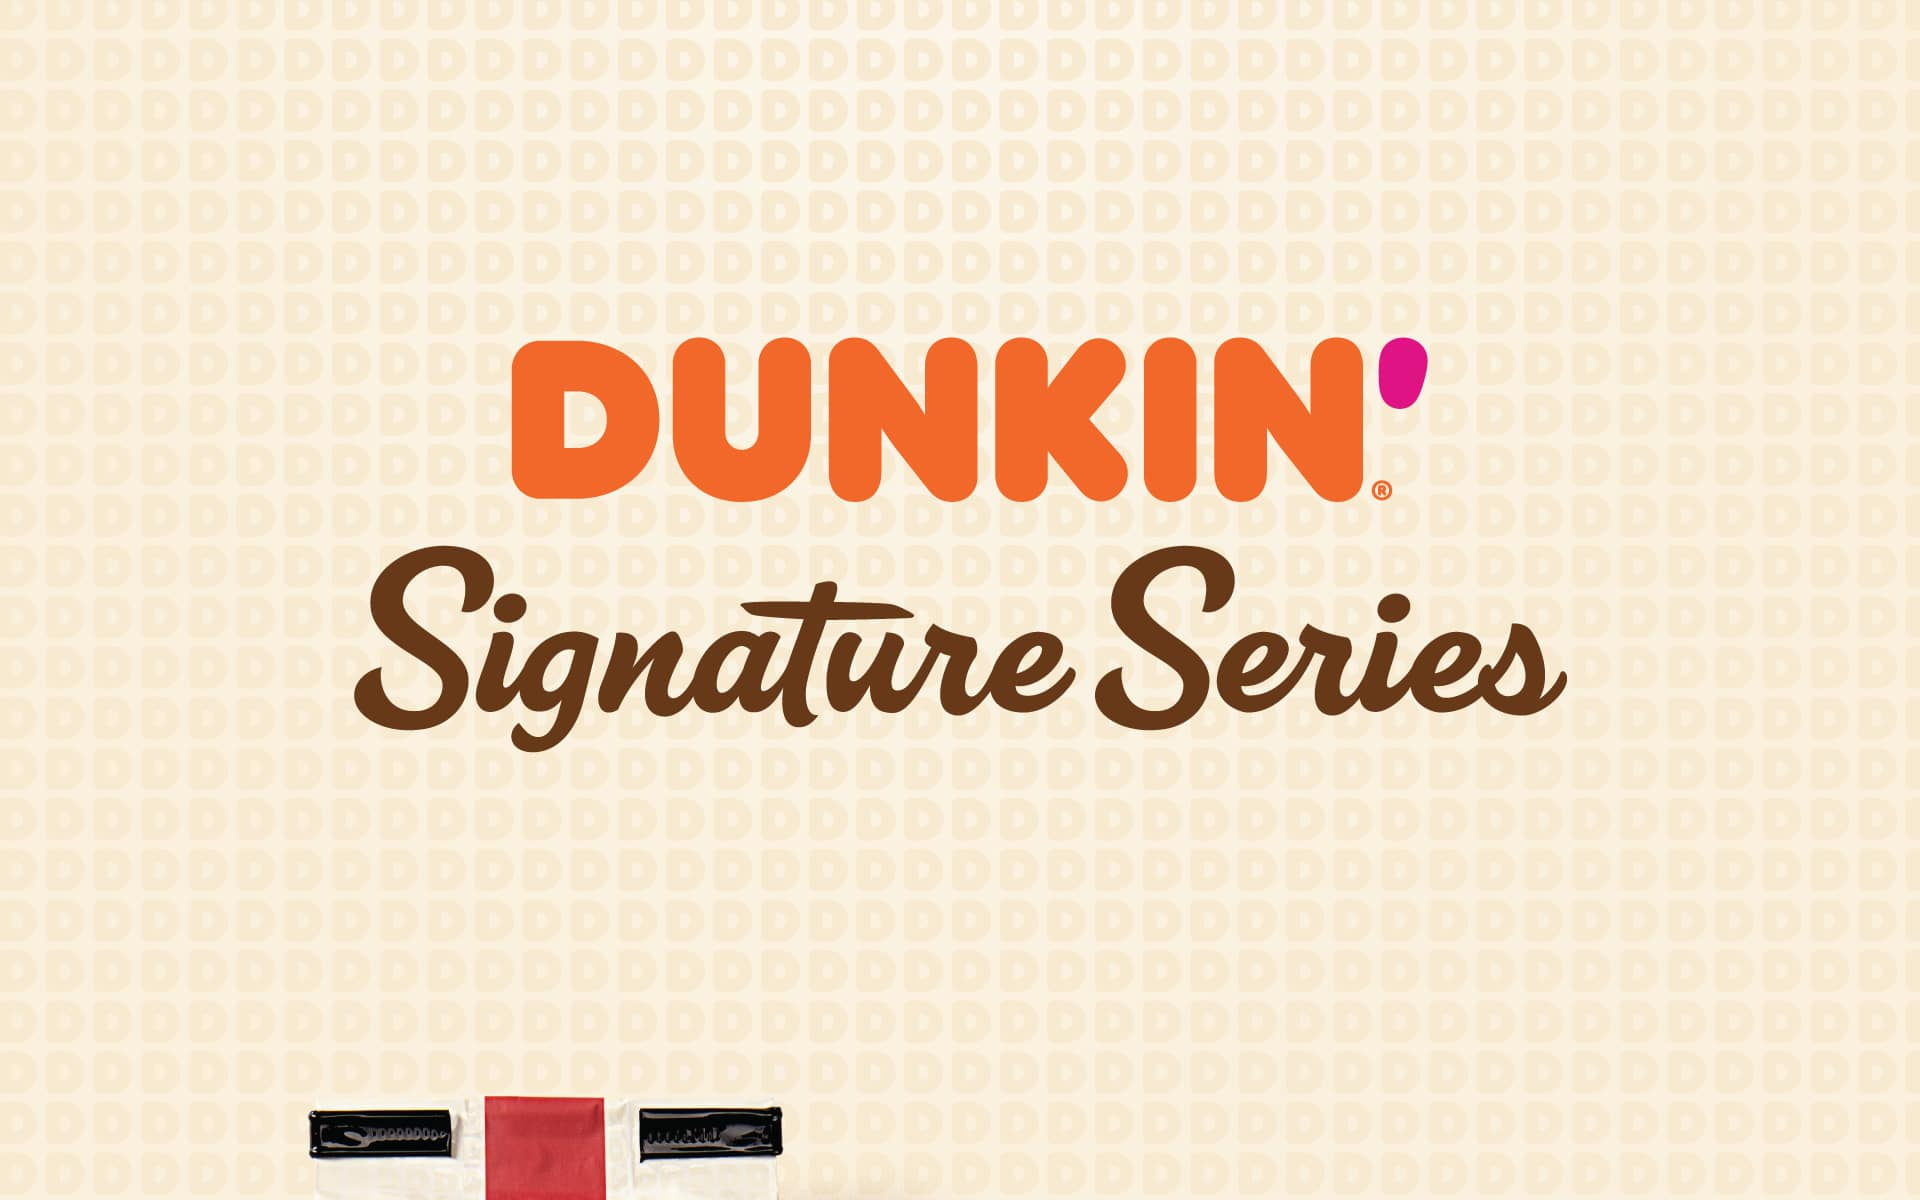 Dunkin Signature Series - Brand Identity